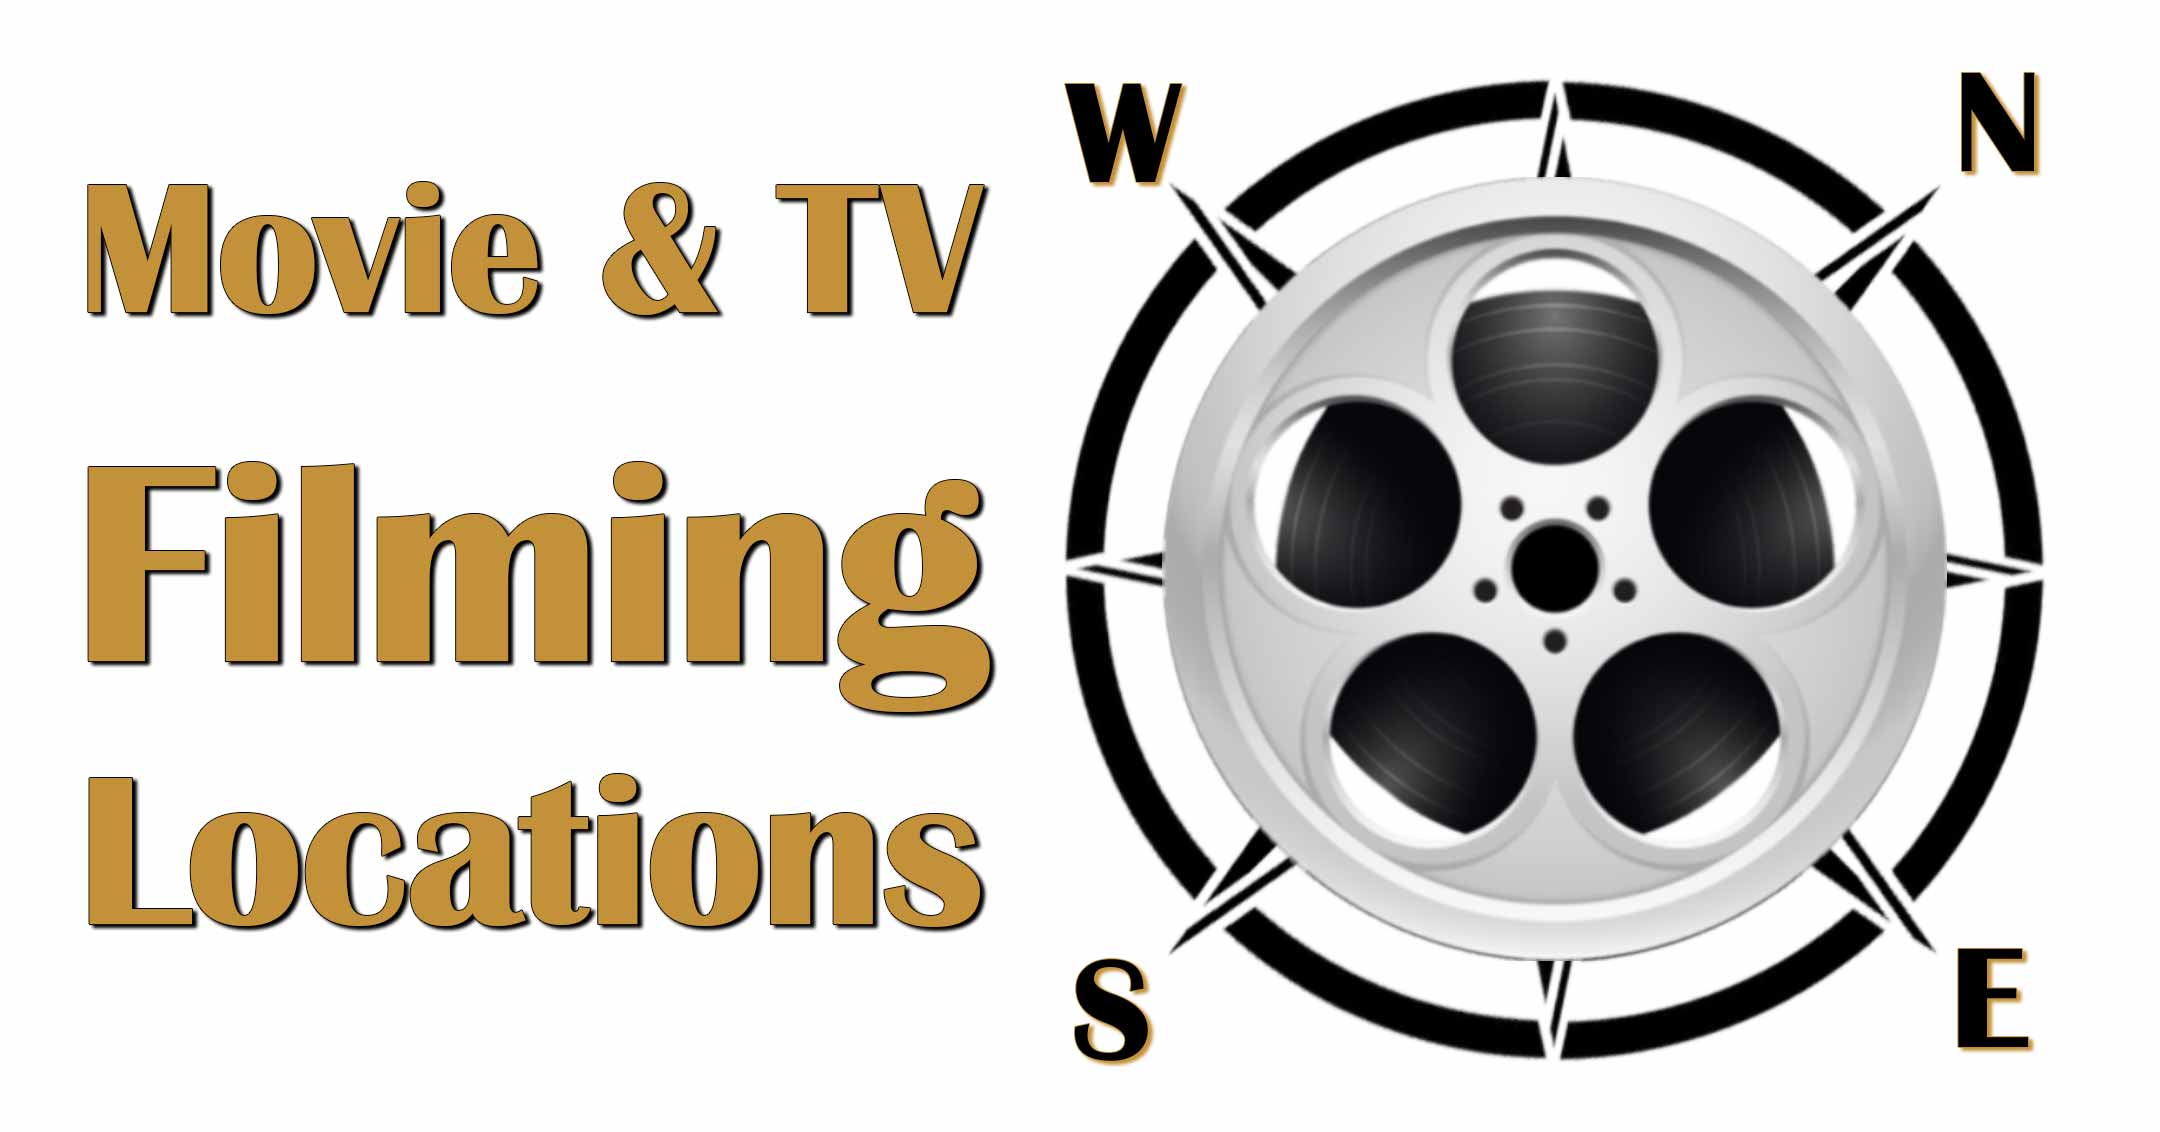 Movie & TV Filming Locations | Tavres.com